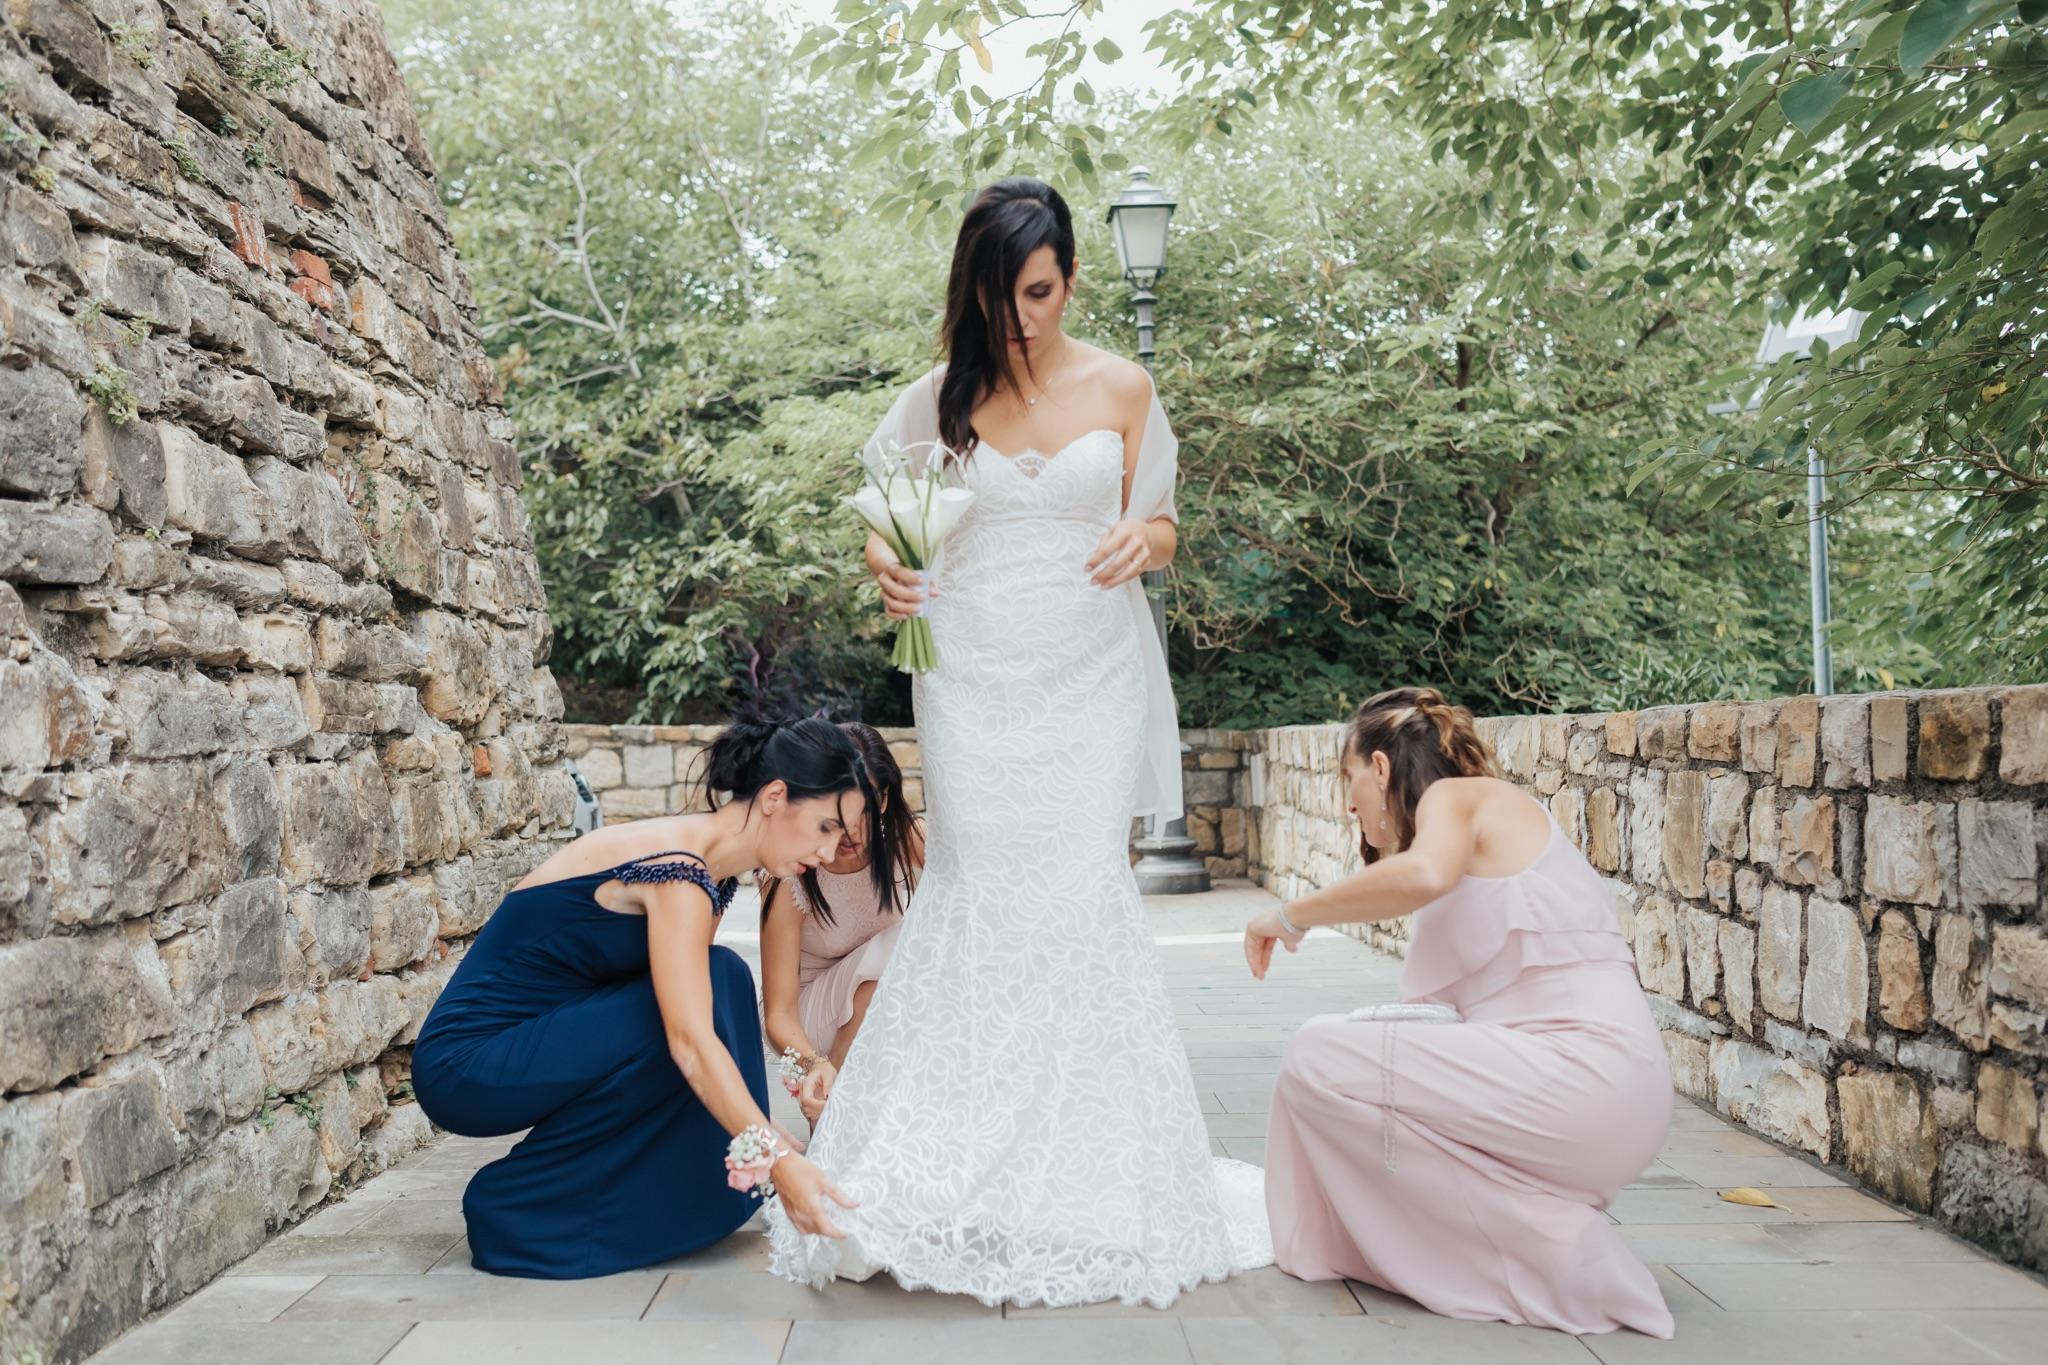 fotografo matrimonio muggia we image foto matrimoniali